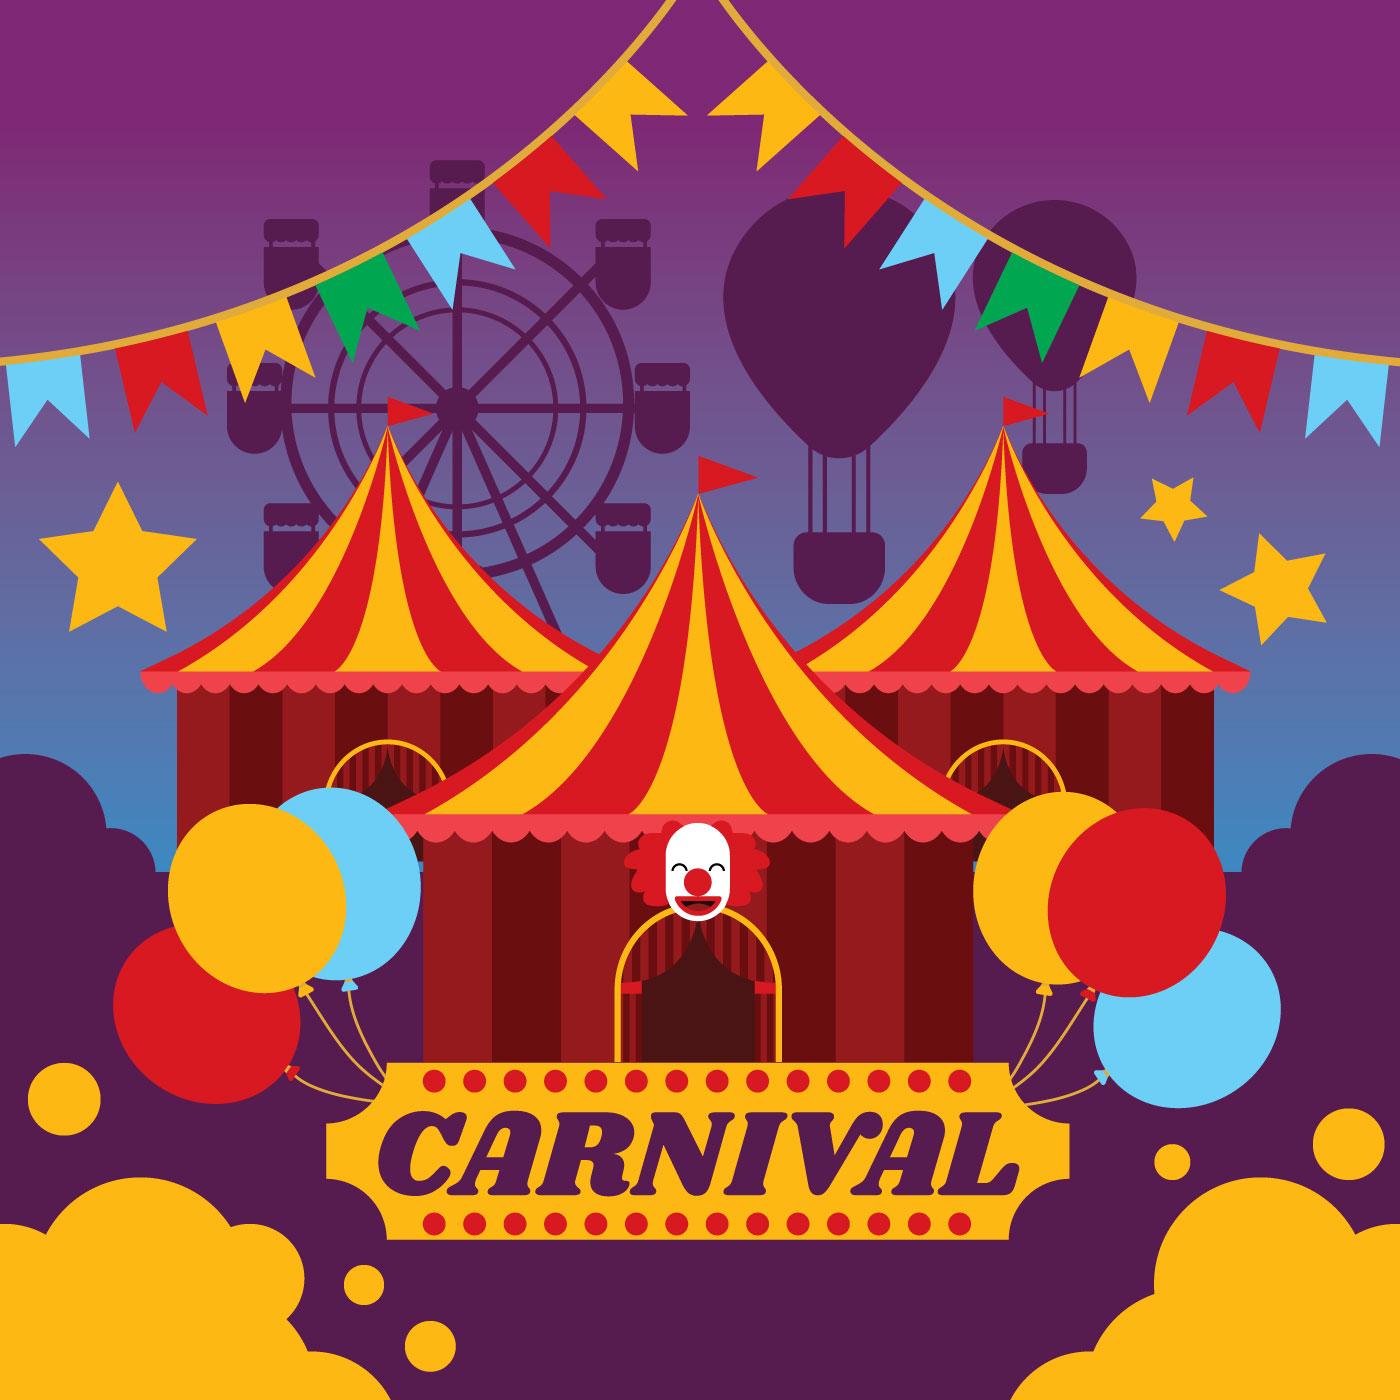 carnival poster illustration